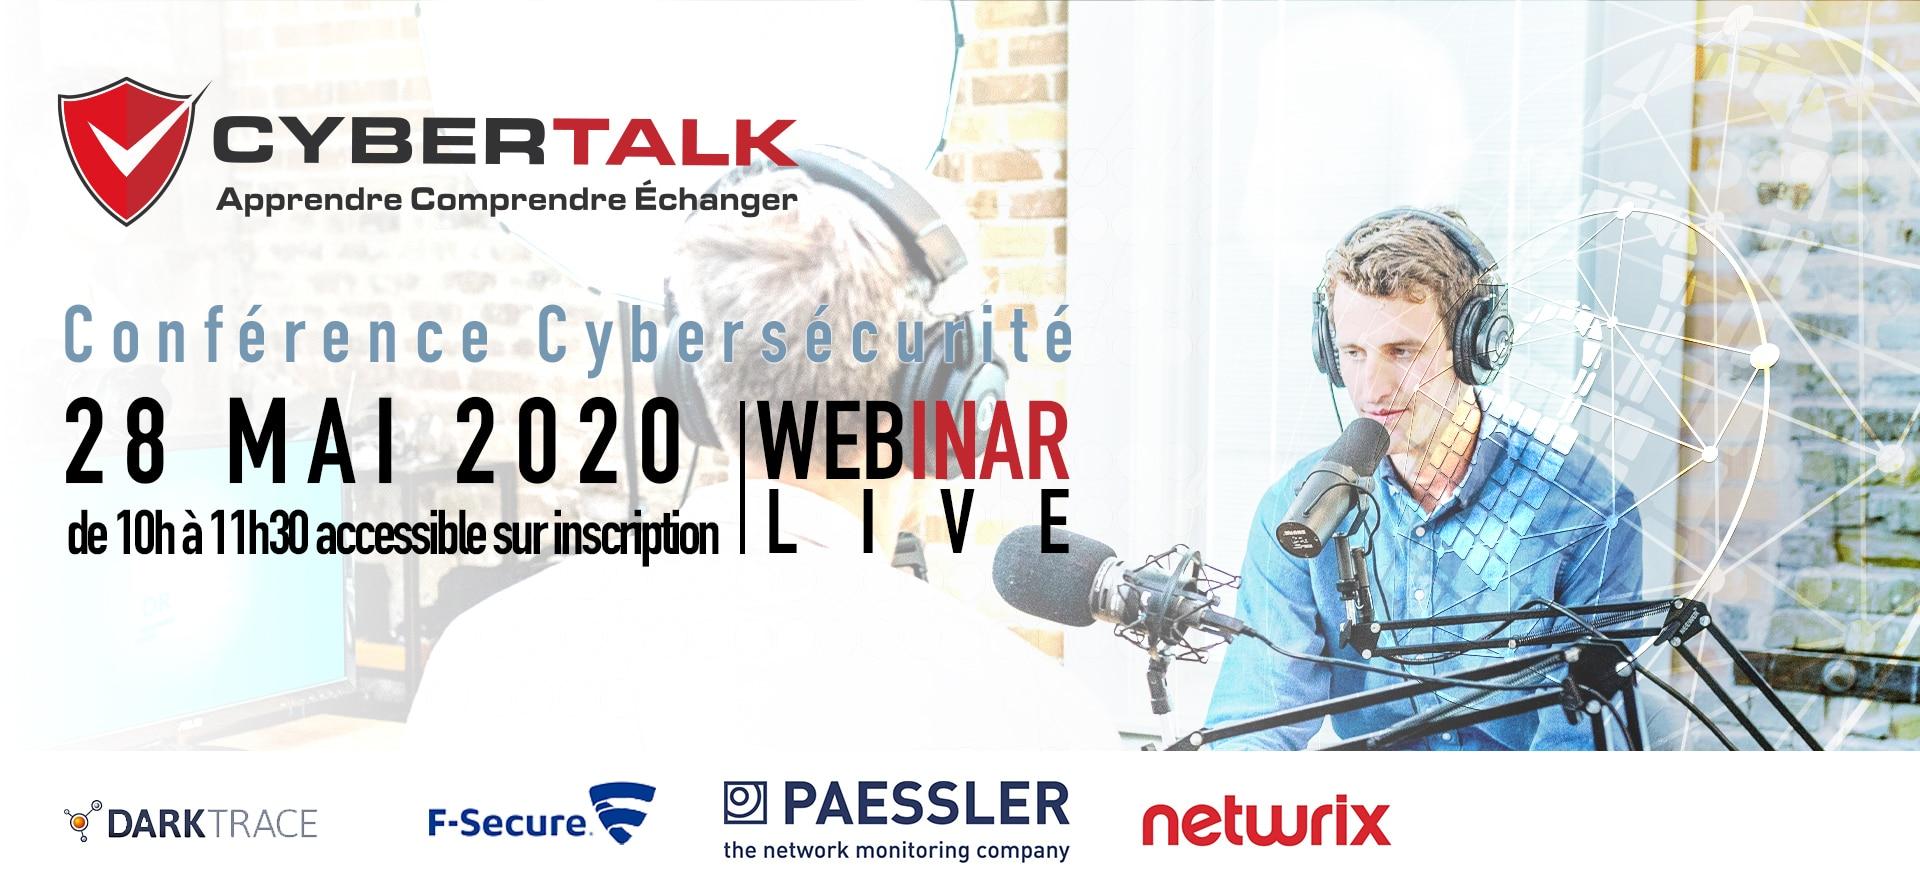 Bannière webinar Cybertalk 28 mai 2020